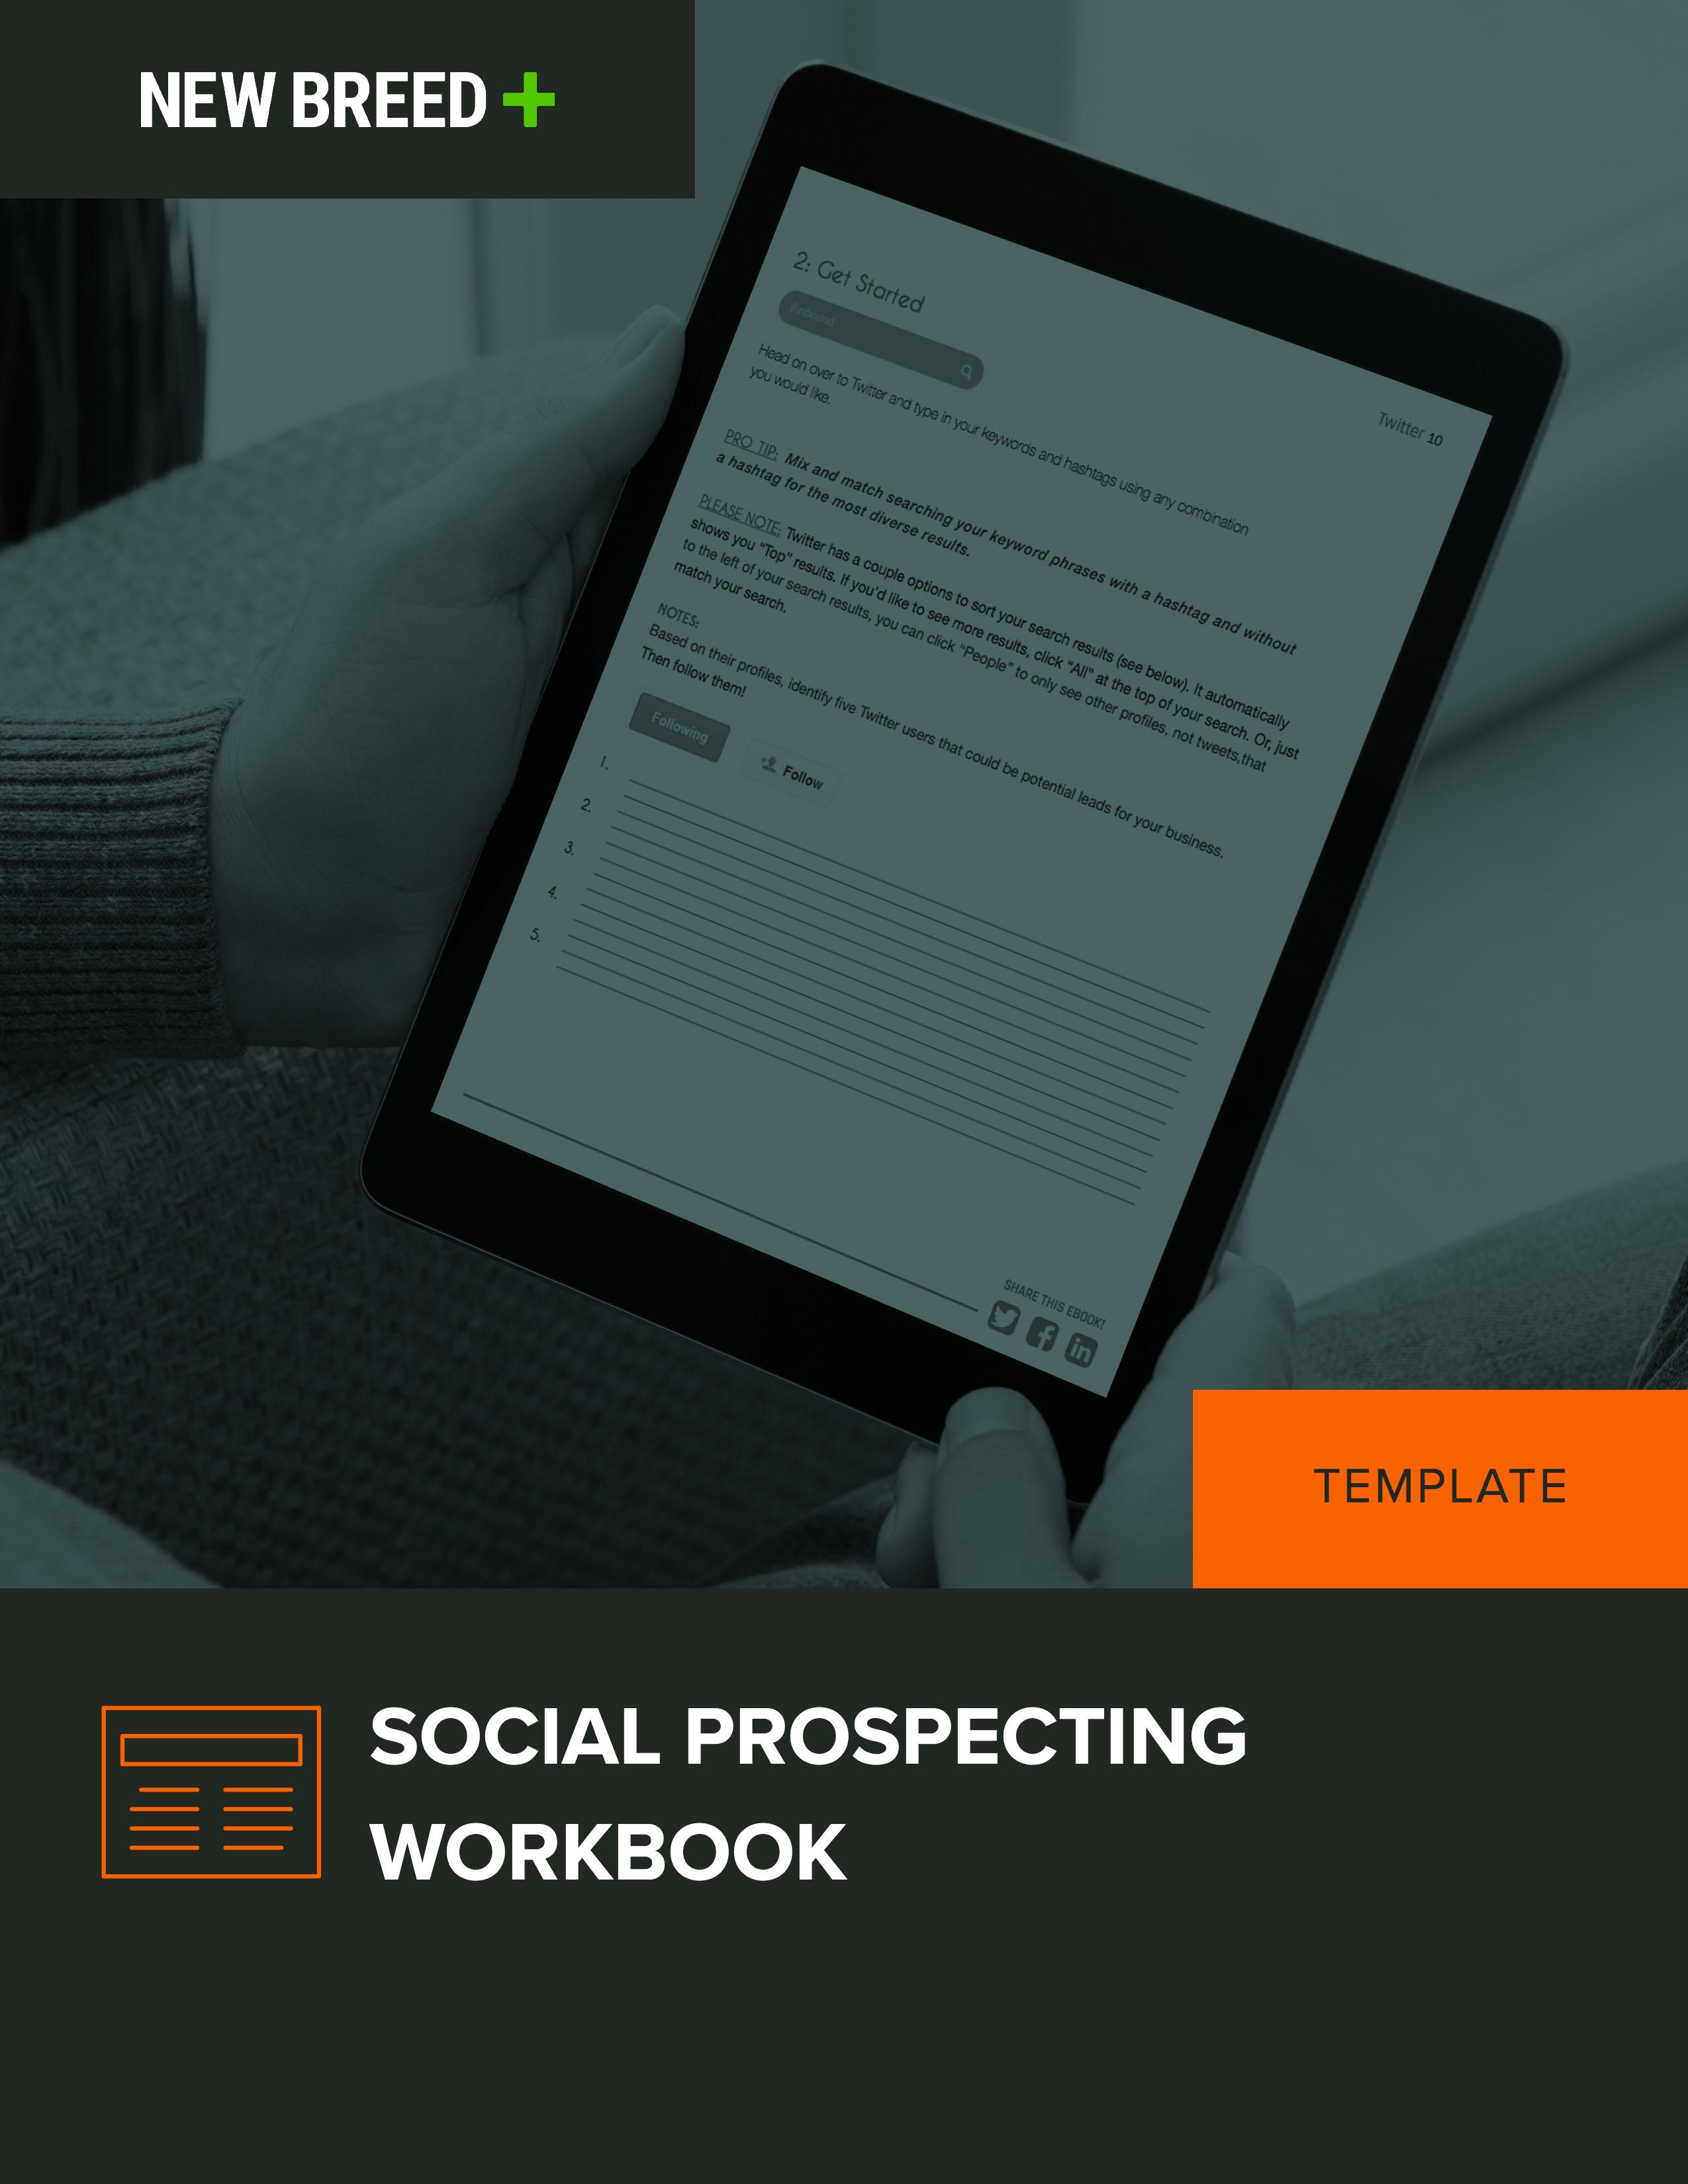 social prospecting workbook-1